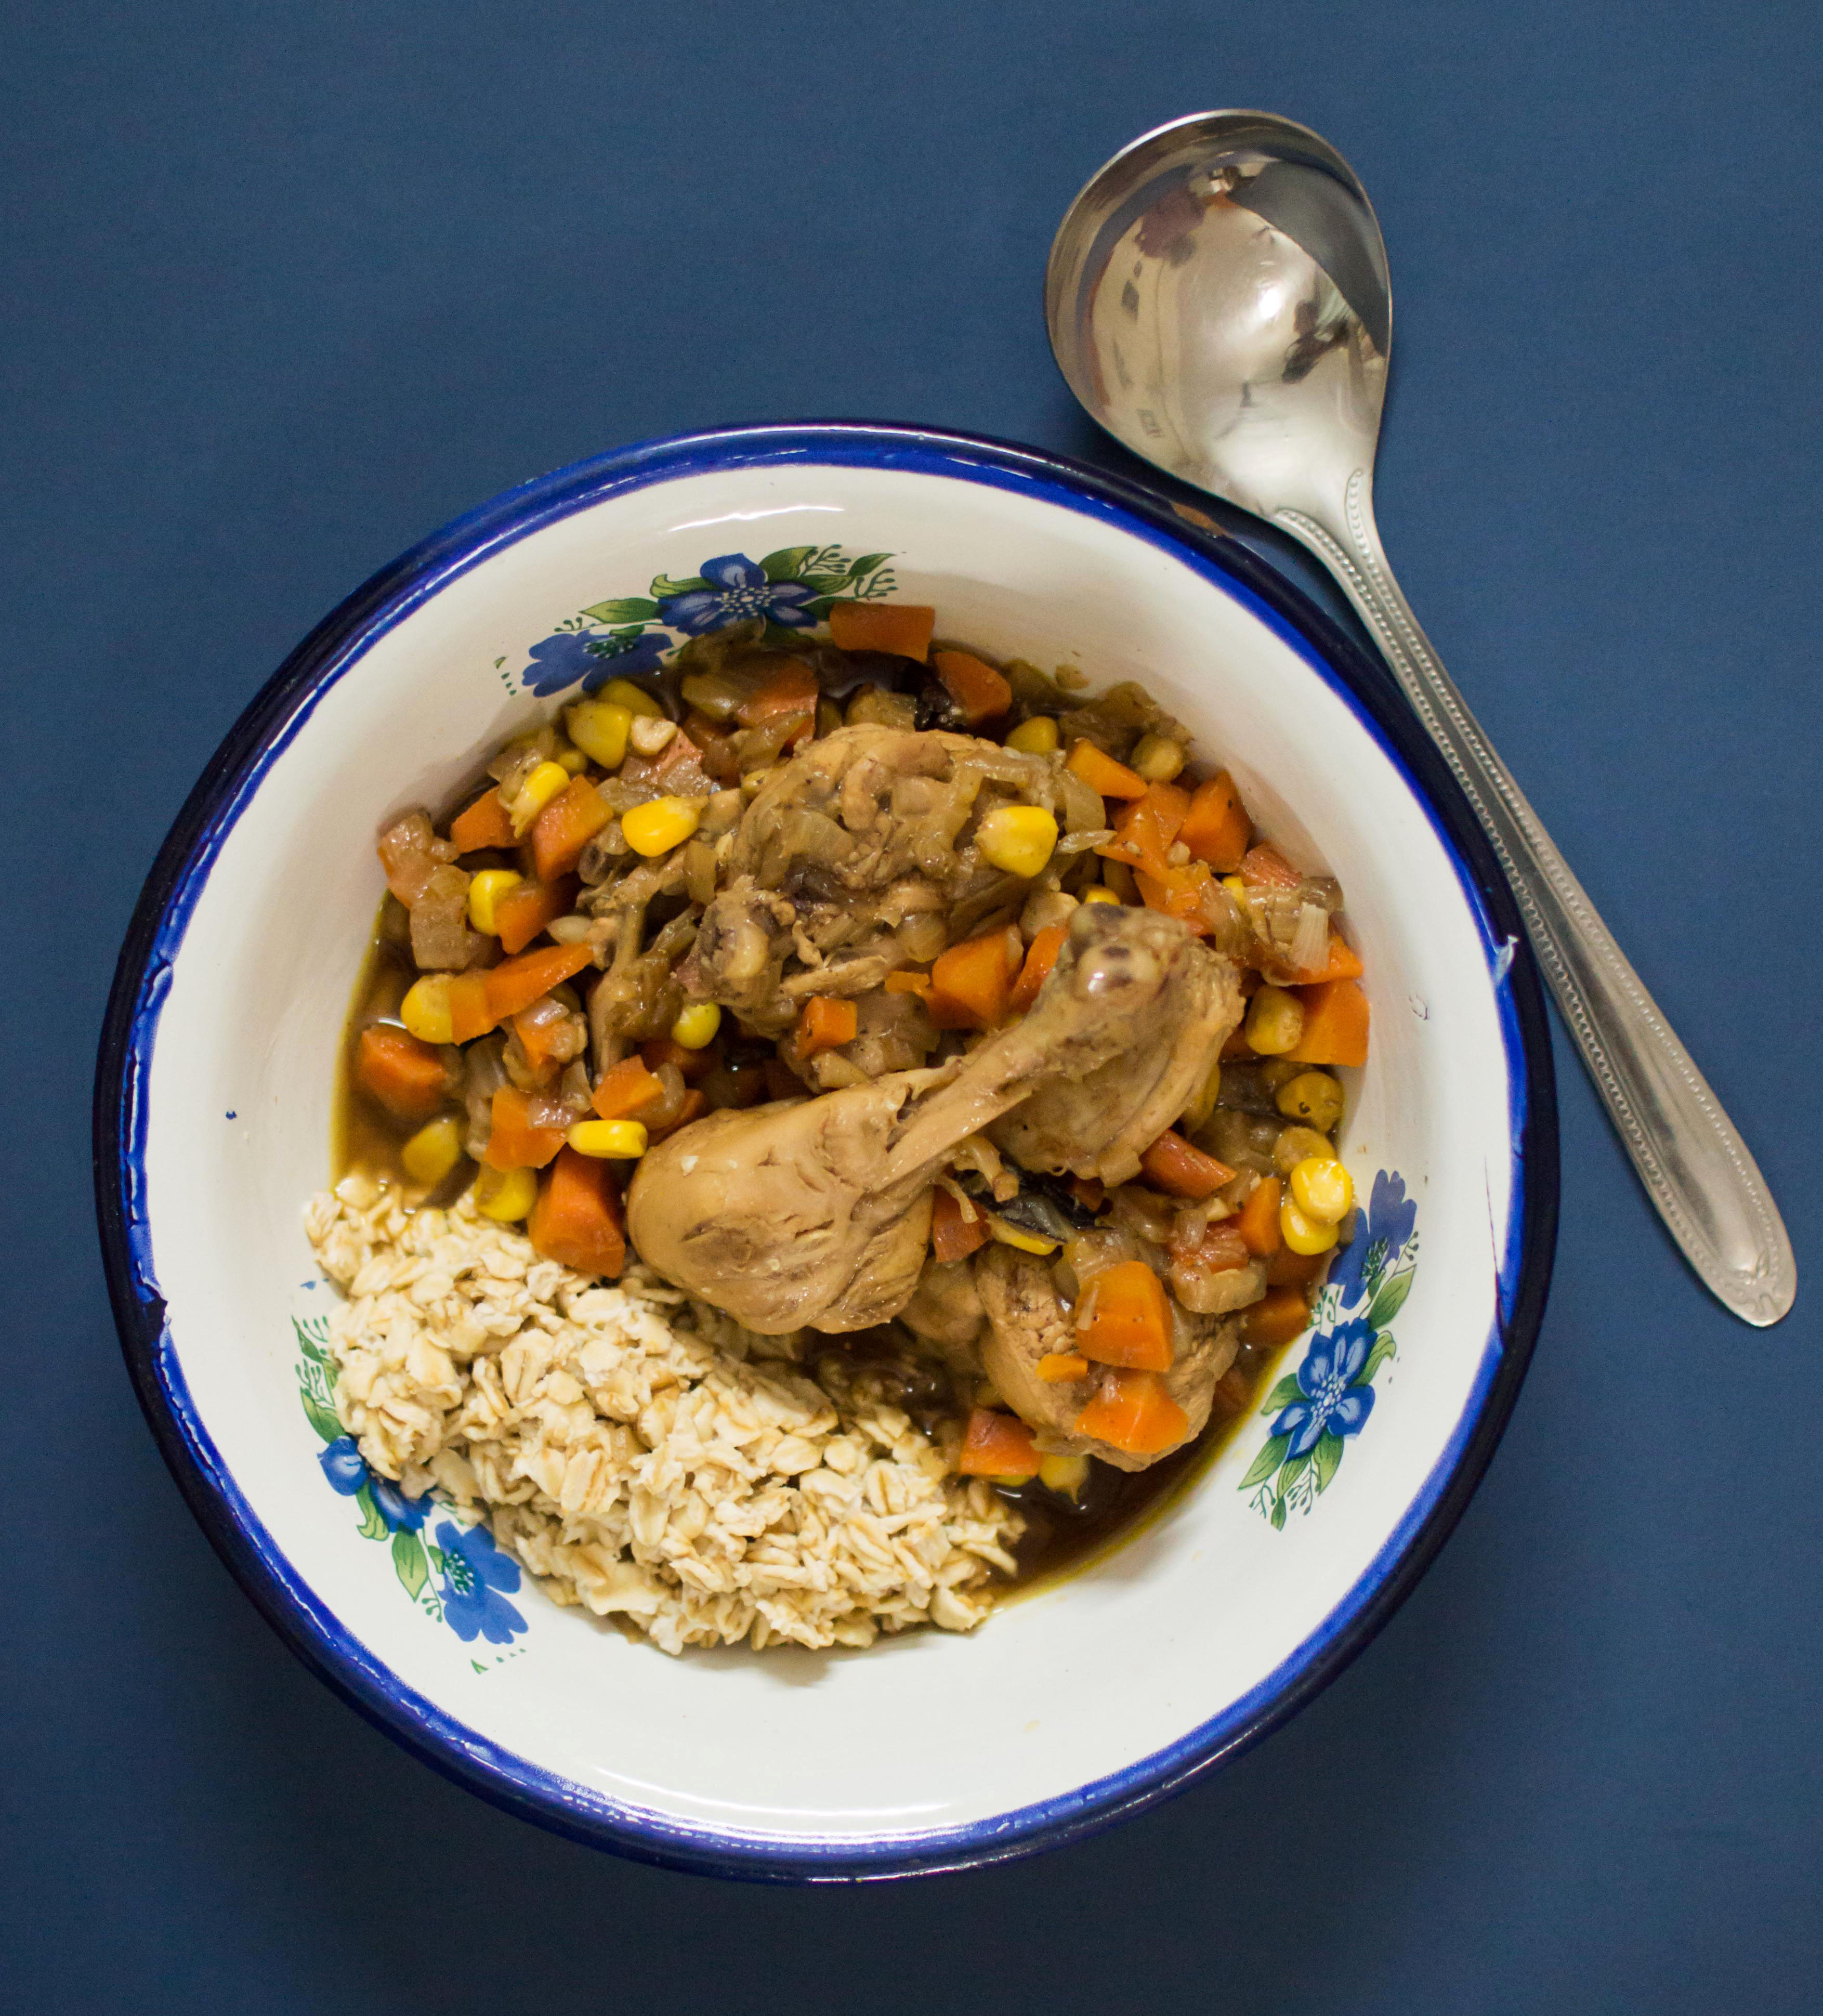 Chicken broth and oats buddha bowl